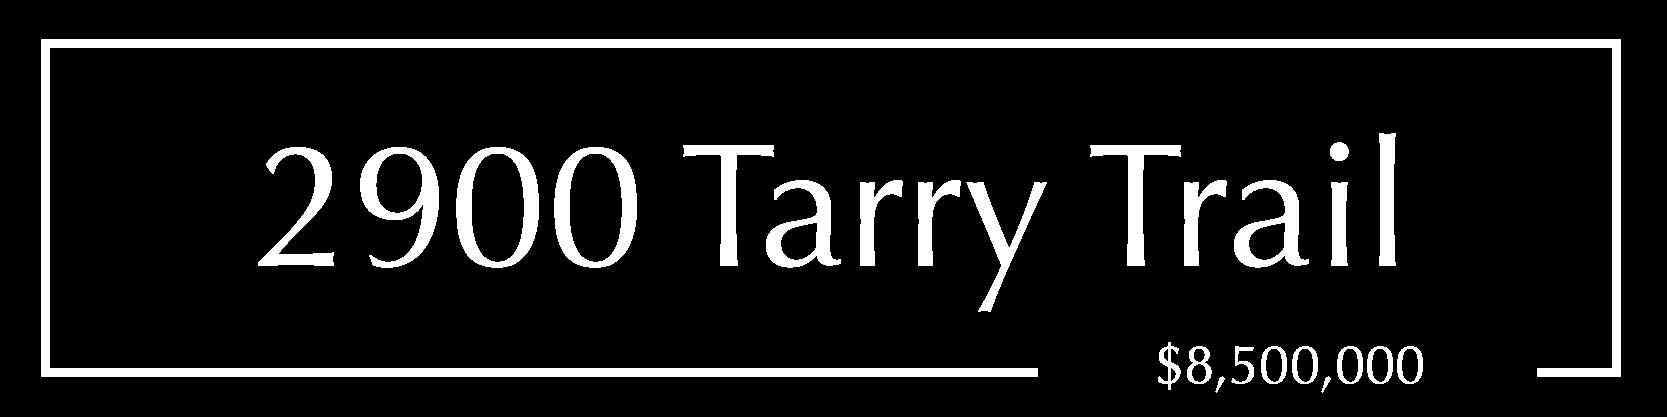 Microsite logo 2900 tarry trail.png?ixlib=rb 3.2